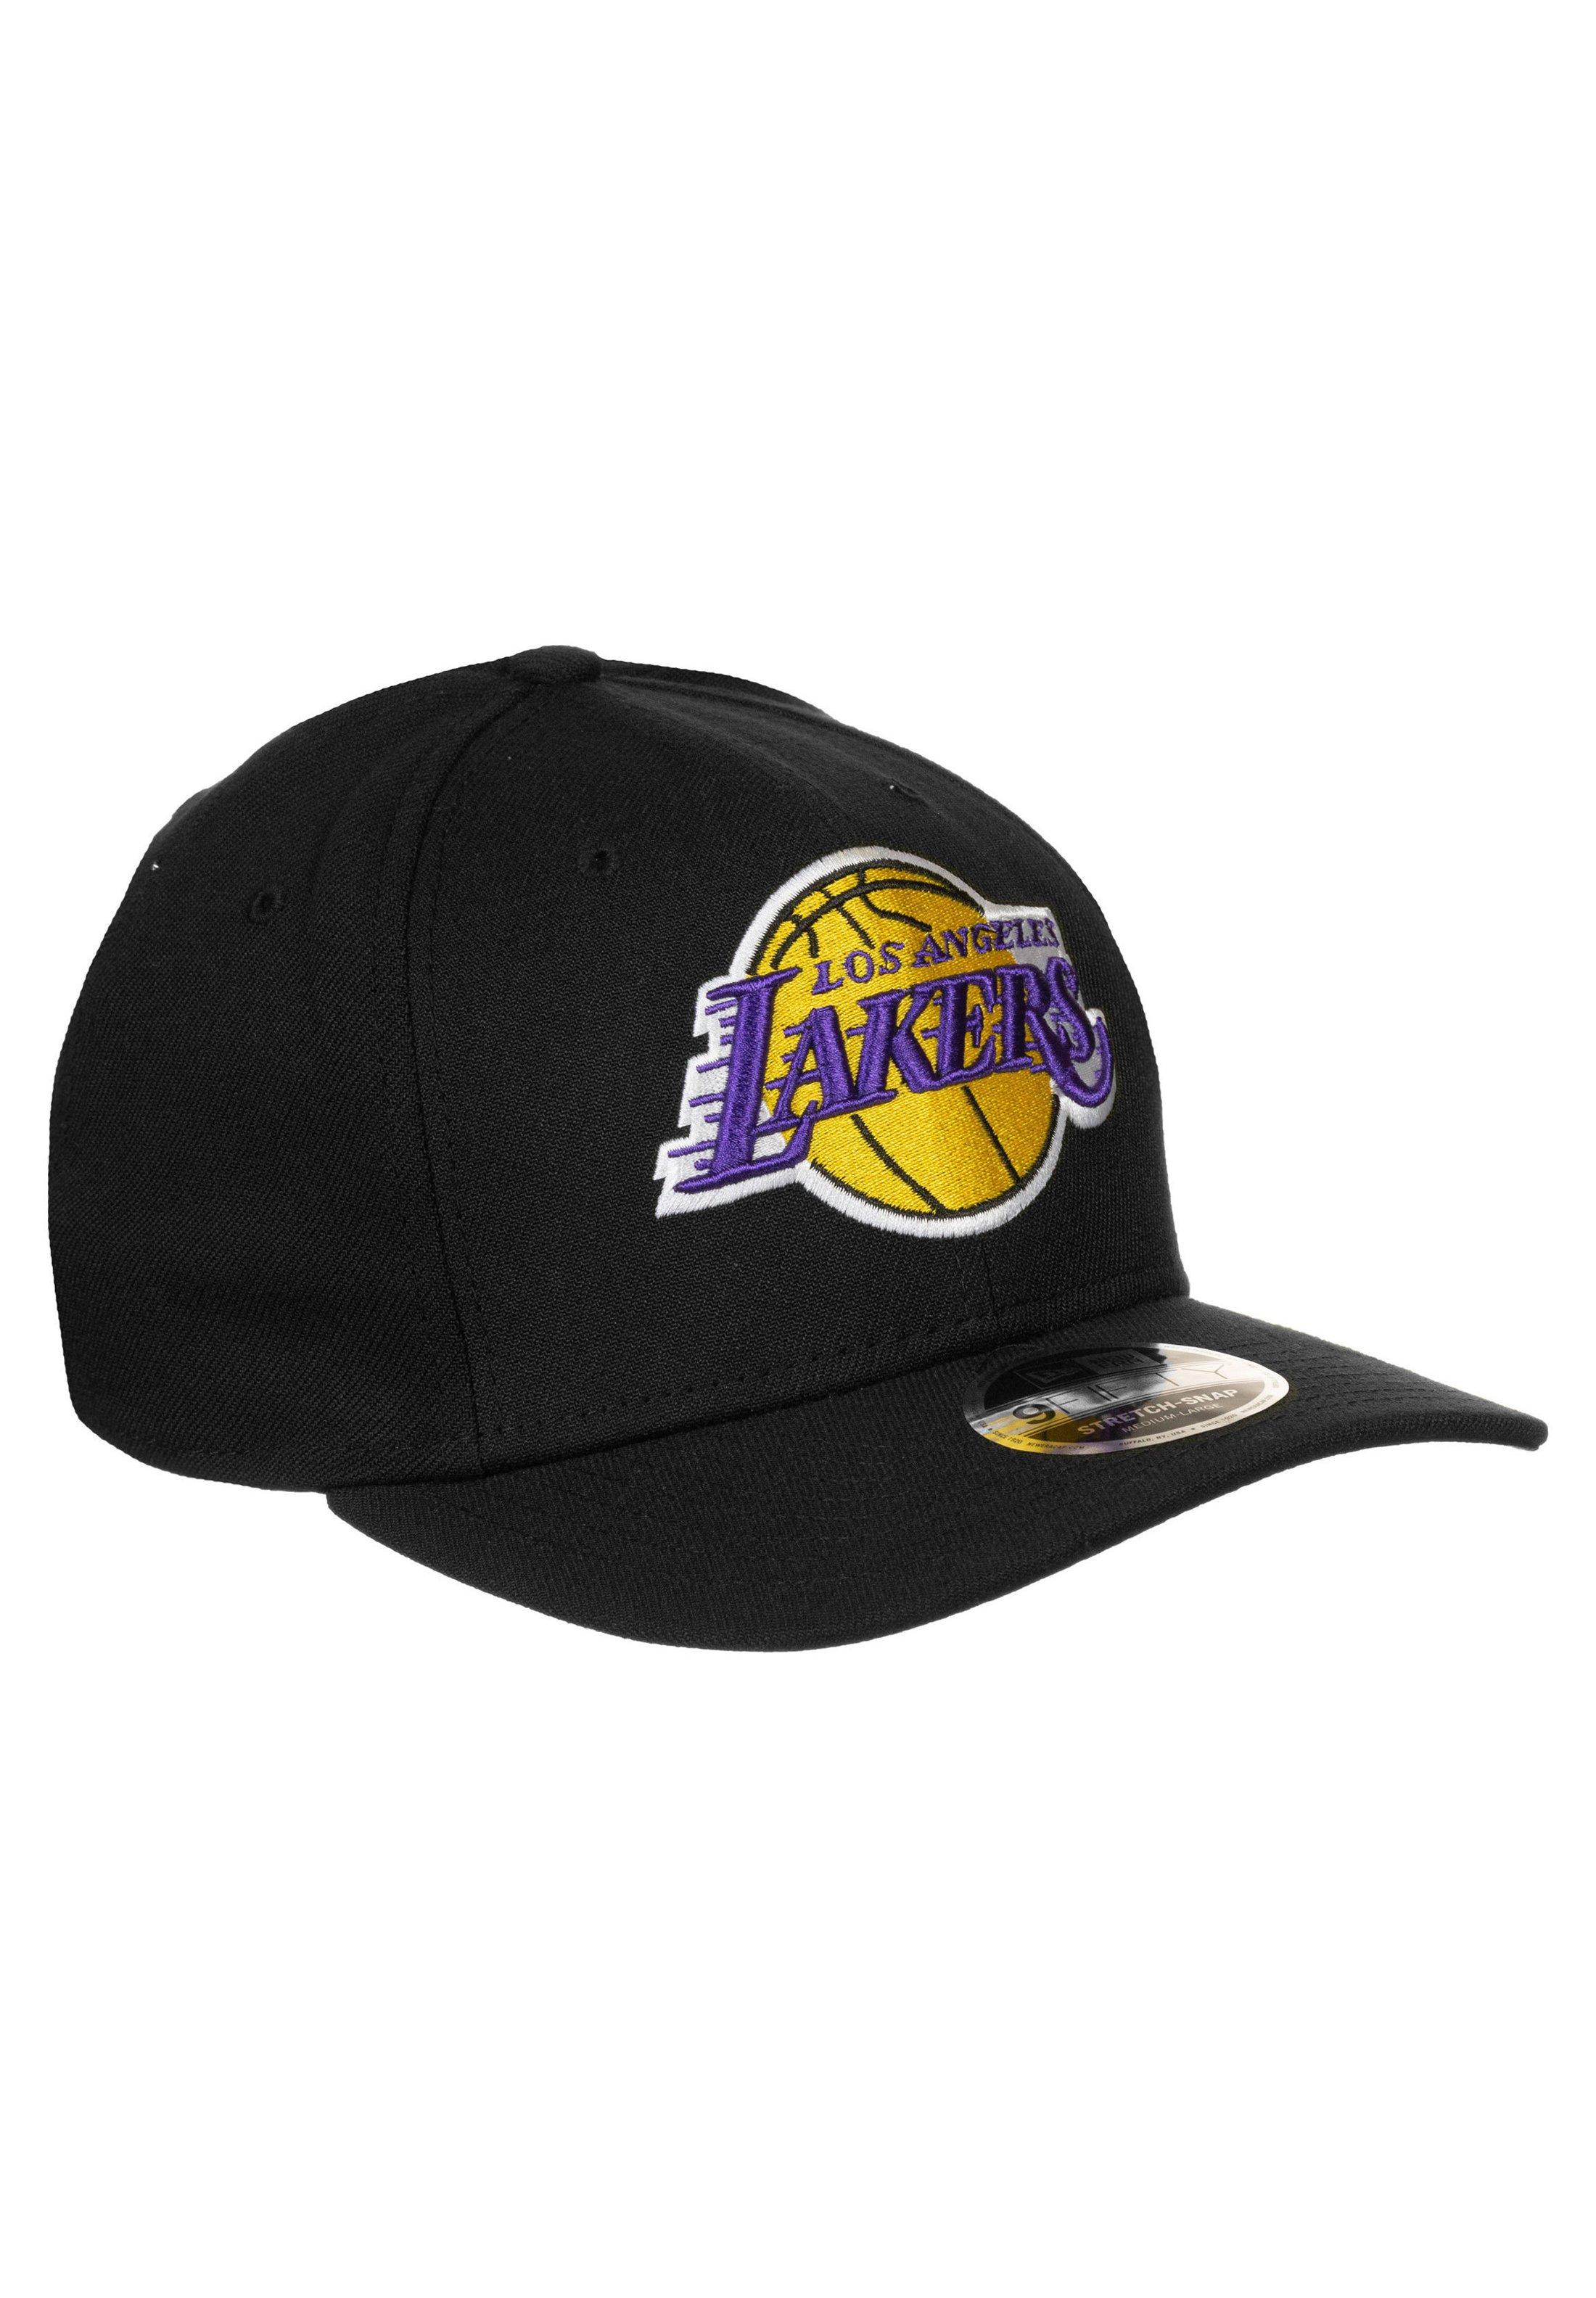 Hombre 9FIFTY NBA LOS ANGELES LAKERS STRETCH SNAPBACK CAP - Gorra